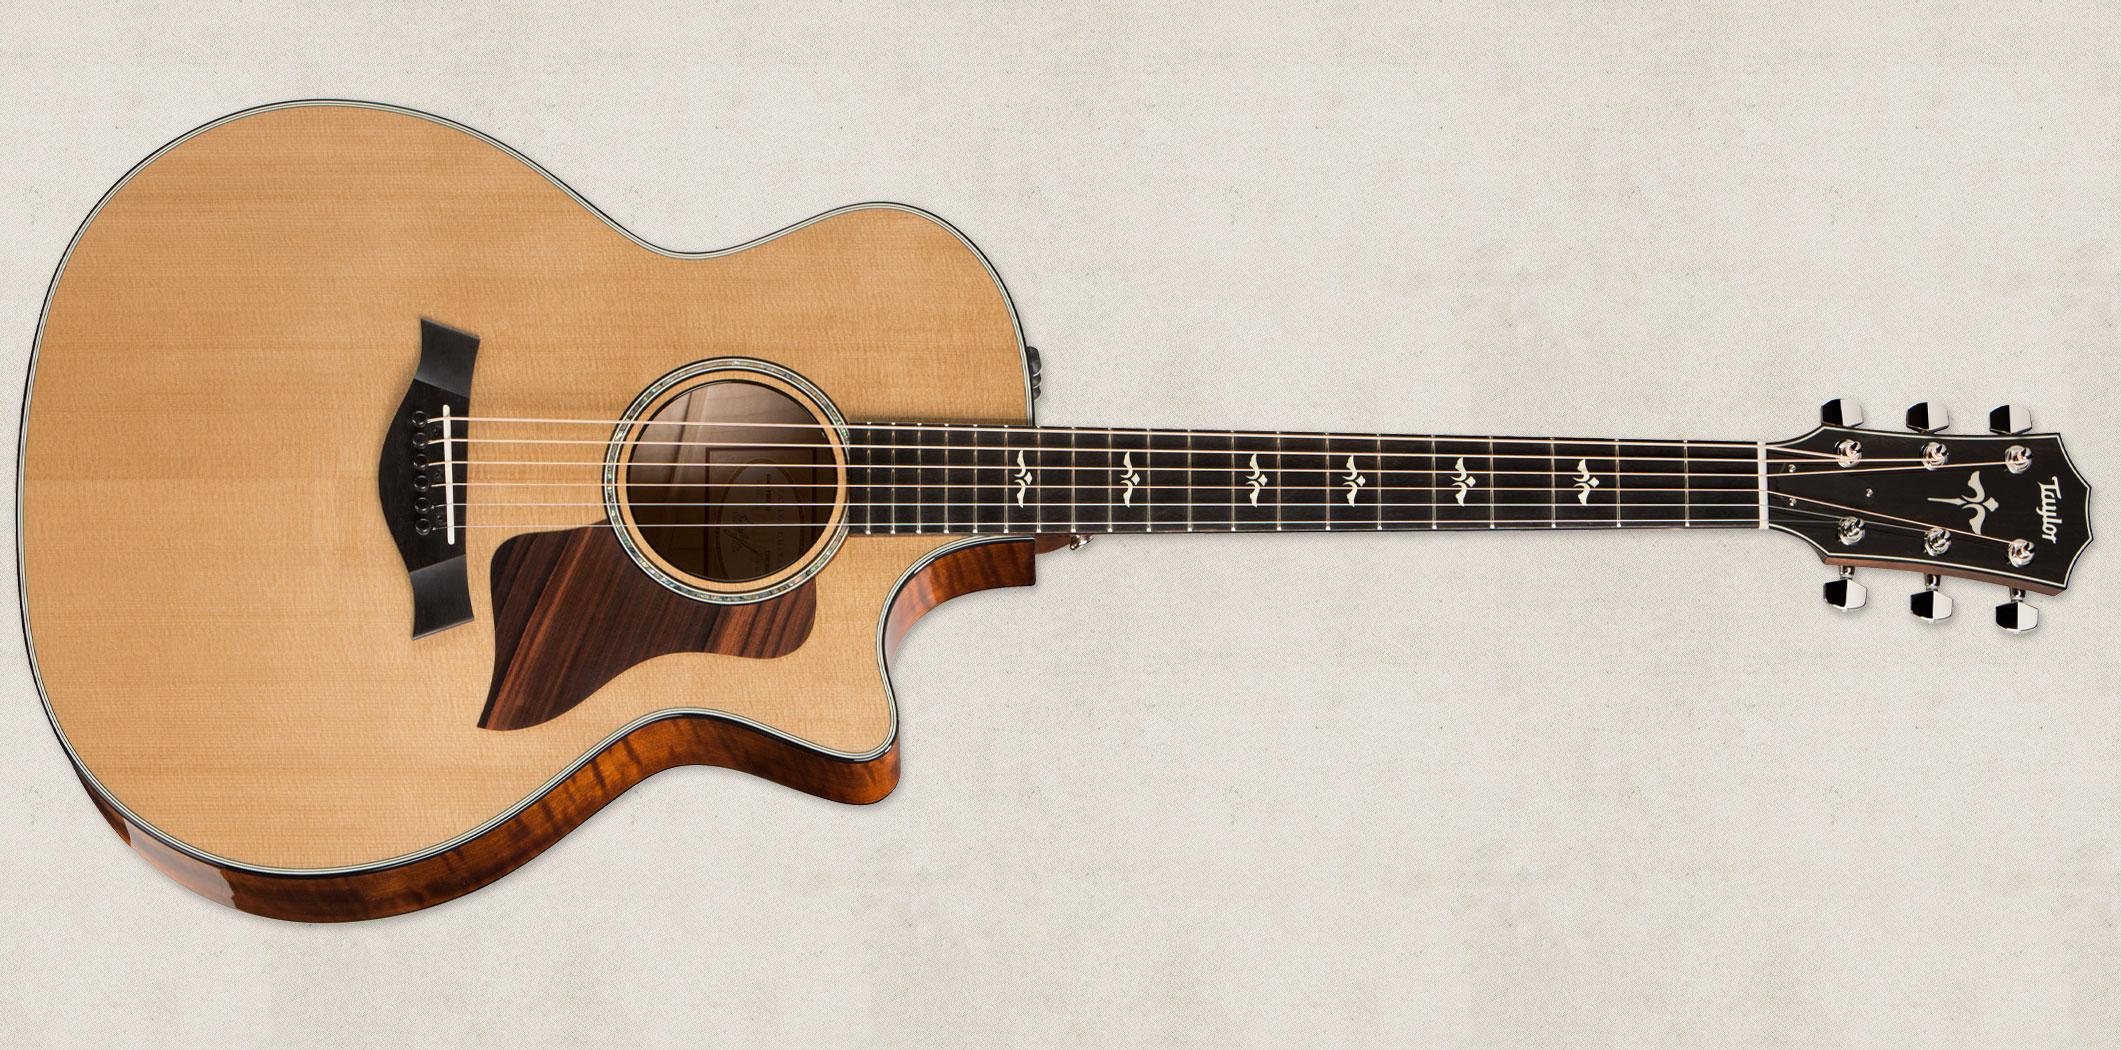 614ce-FE-brn-front-taylor-guitars-2015-full